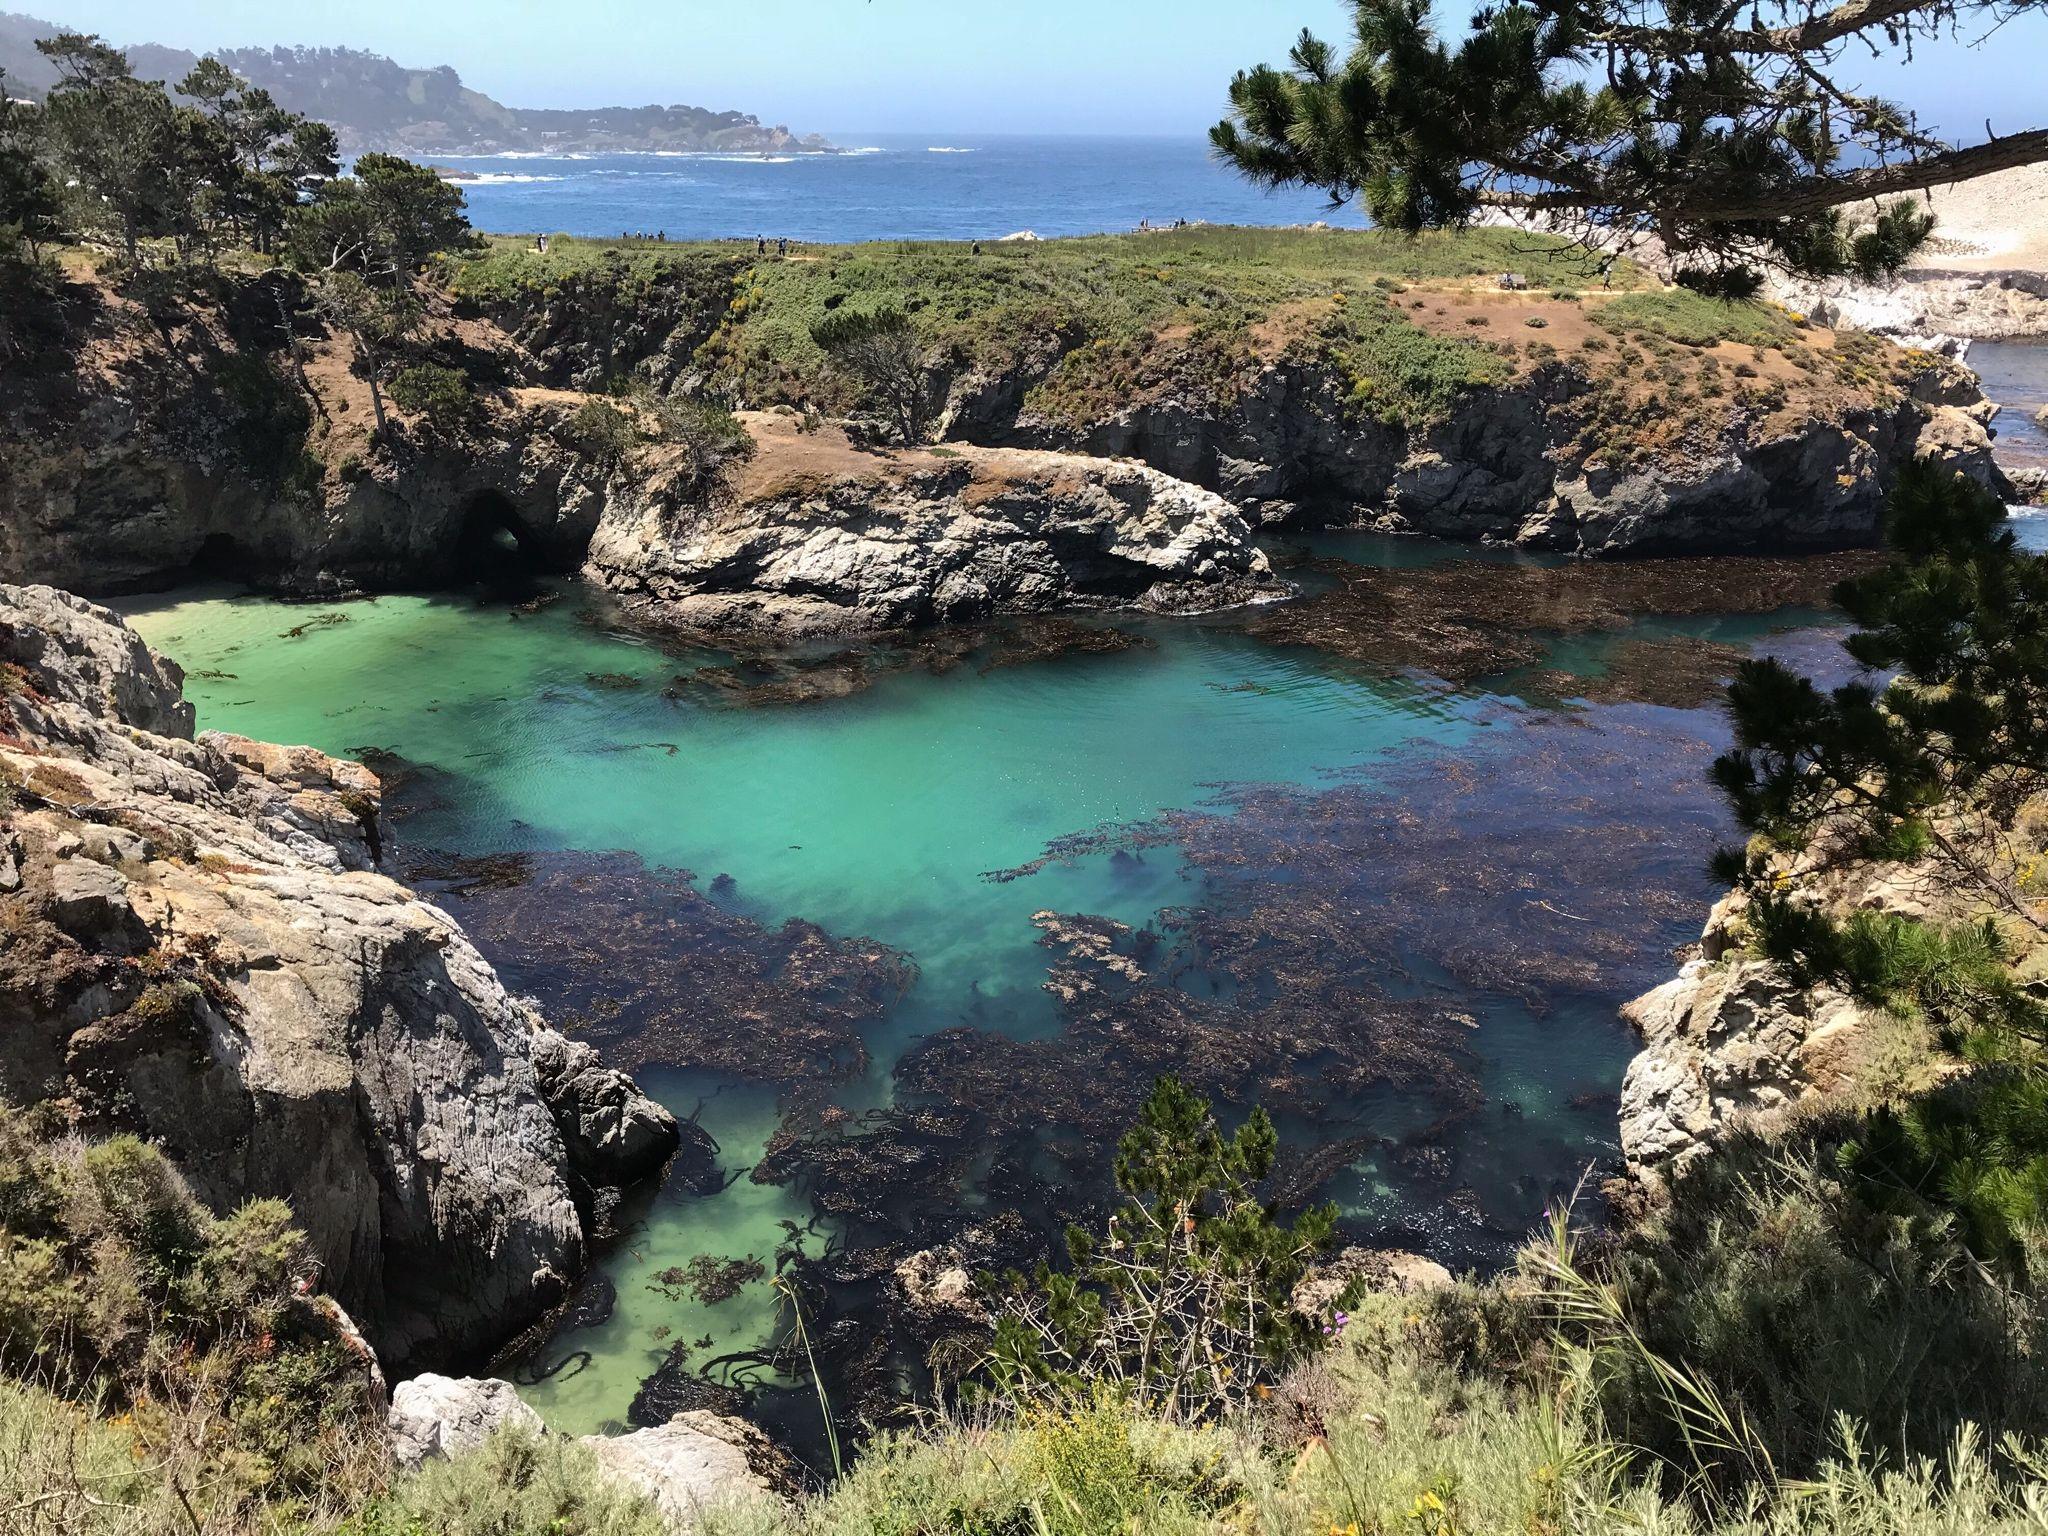 point lobos reserve california 4032x3024 free stuffs on site rh pinterest com